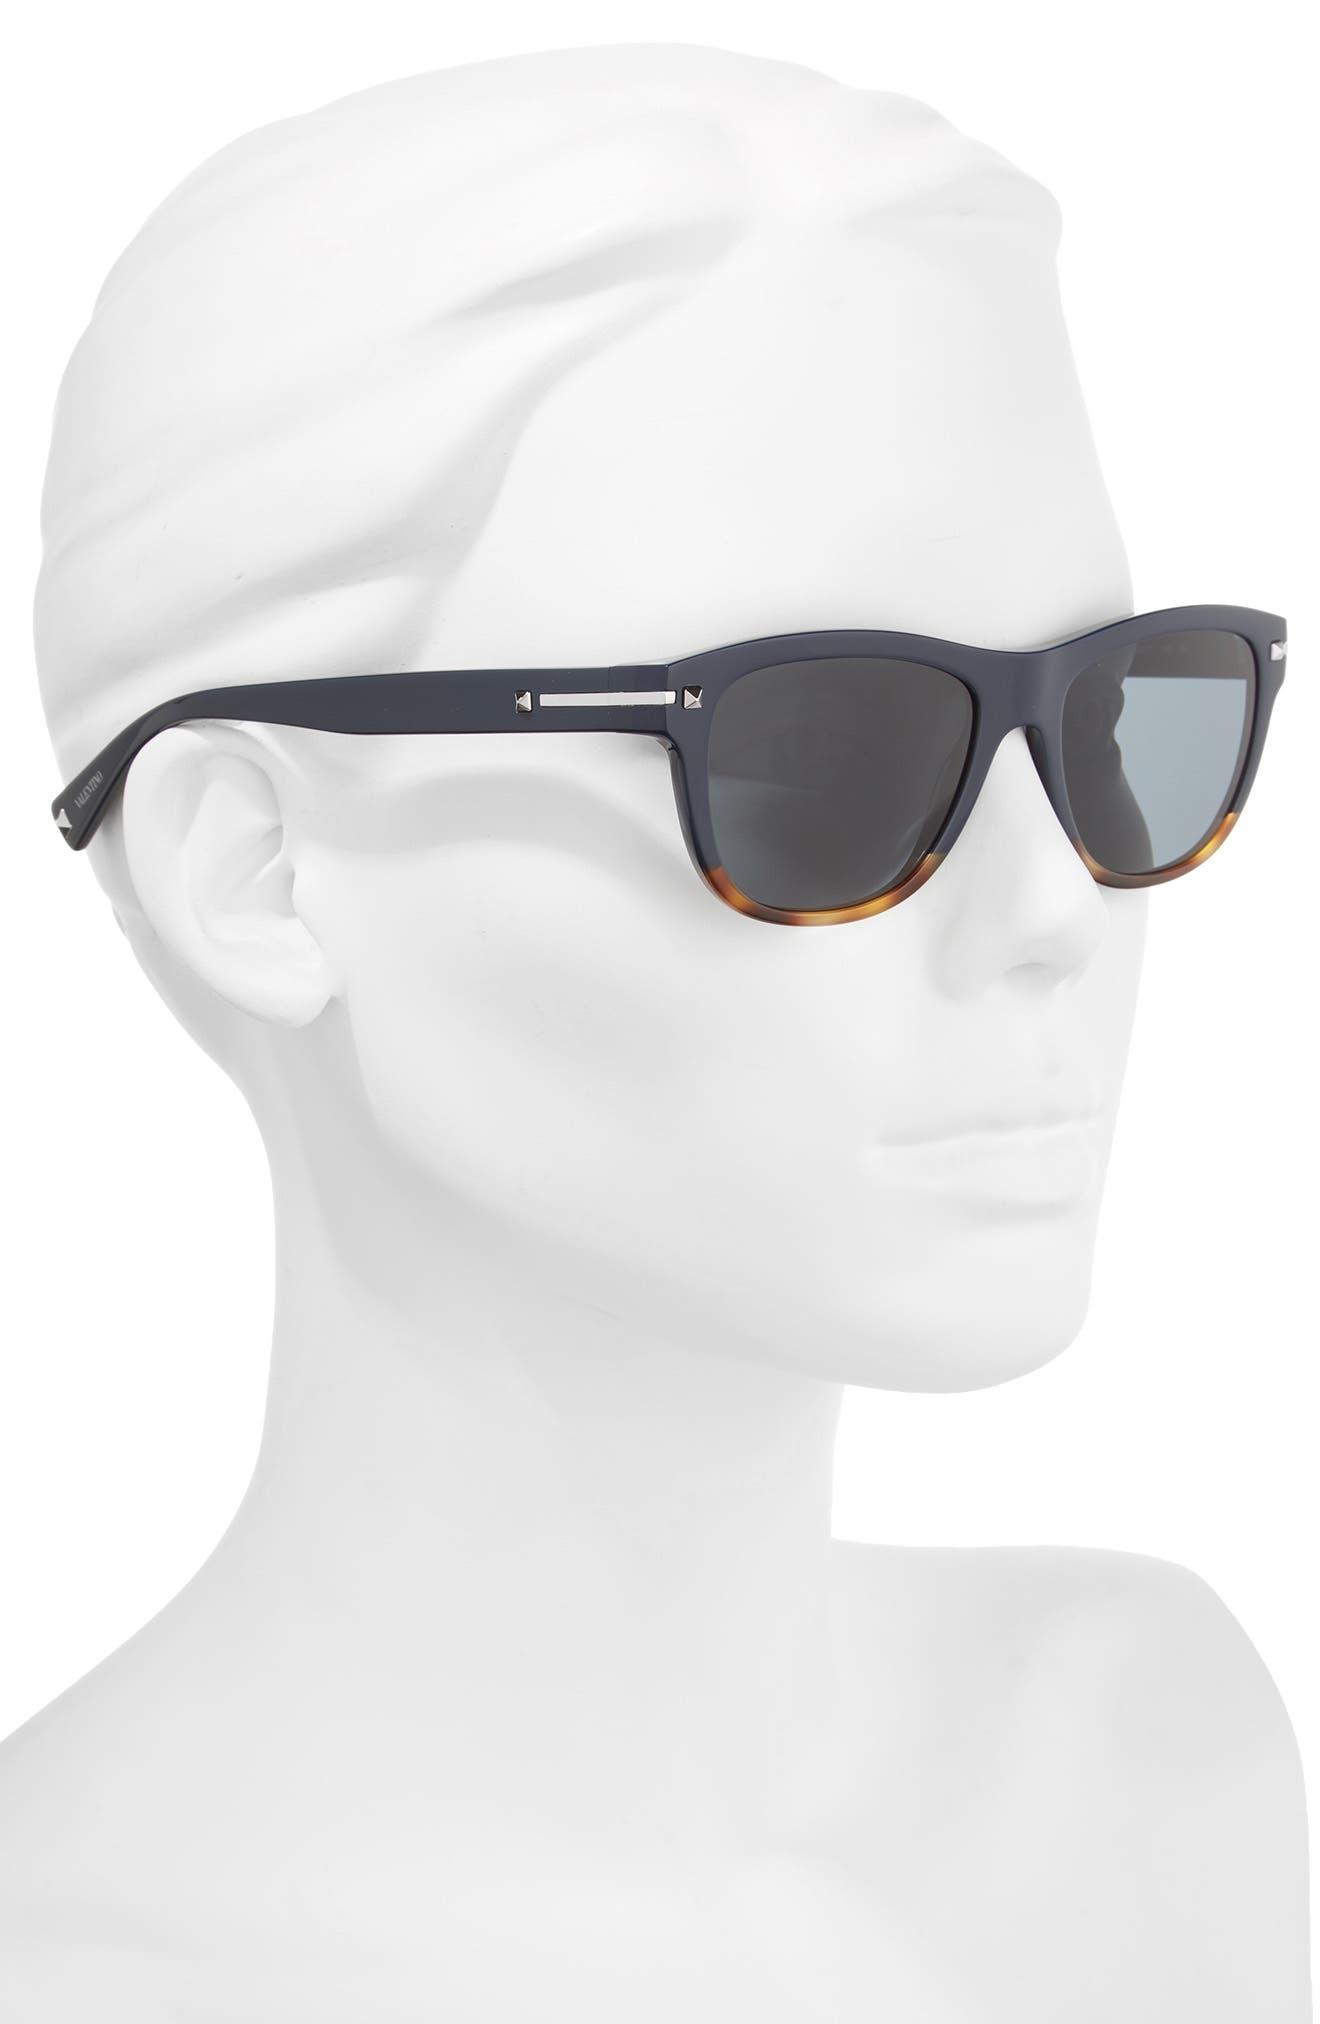 53mm Rectangle Sunglasses,                             Alternate thumbnail 2, color,                             Blue/ Havana